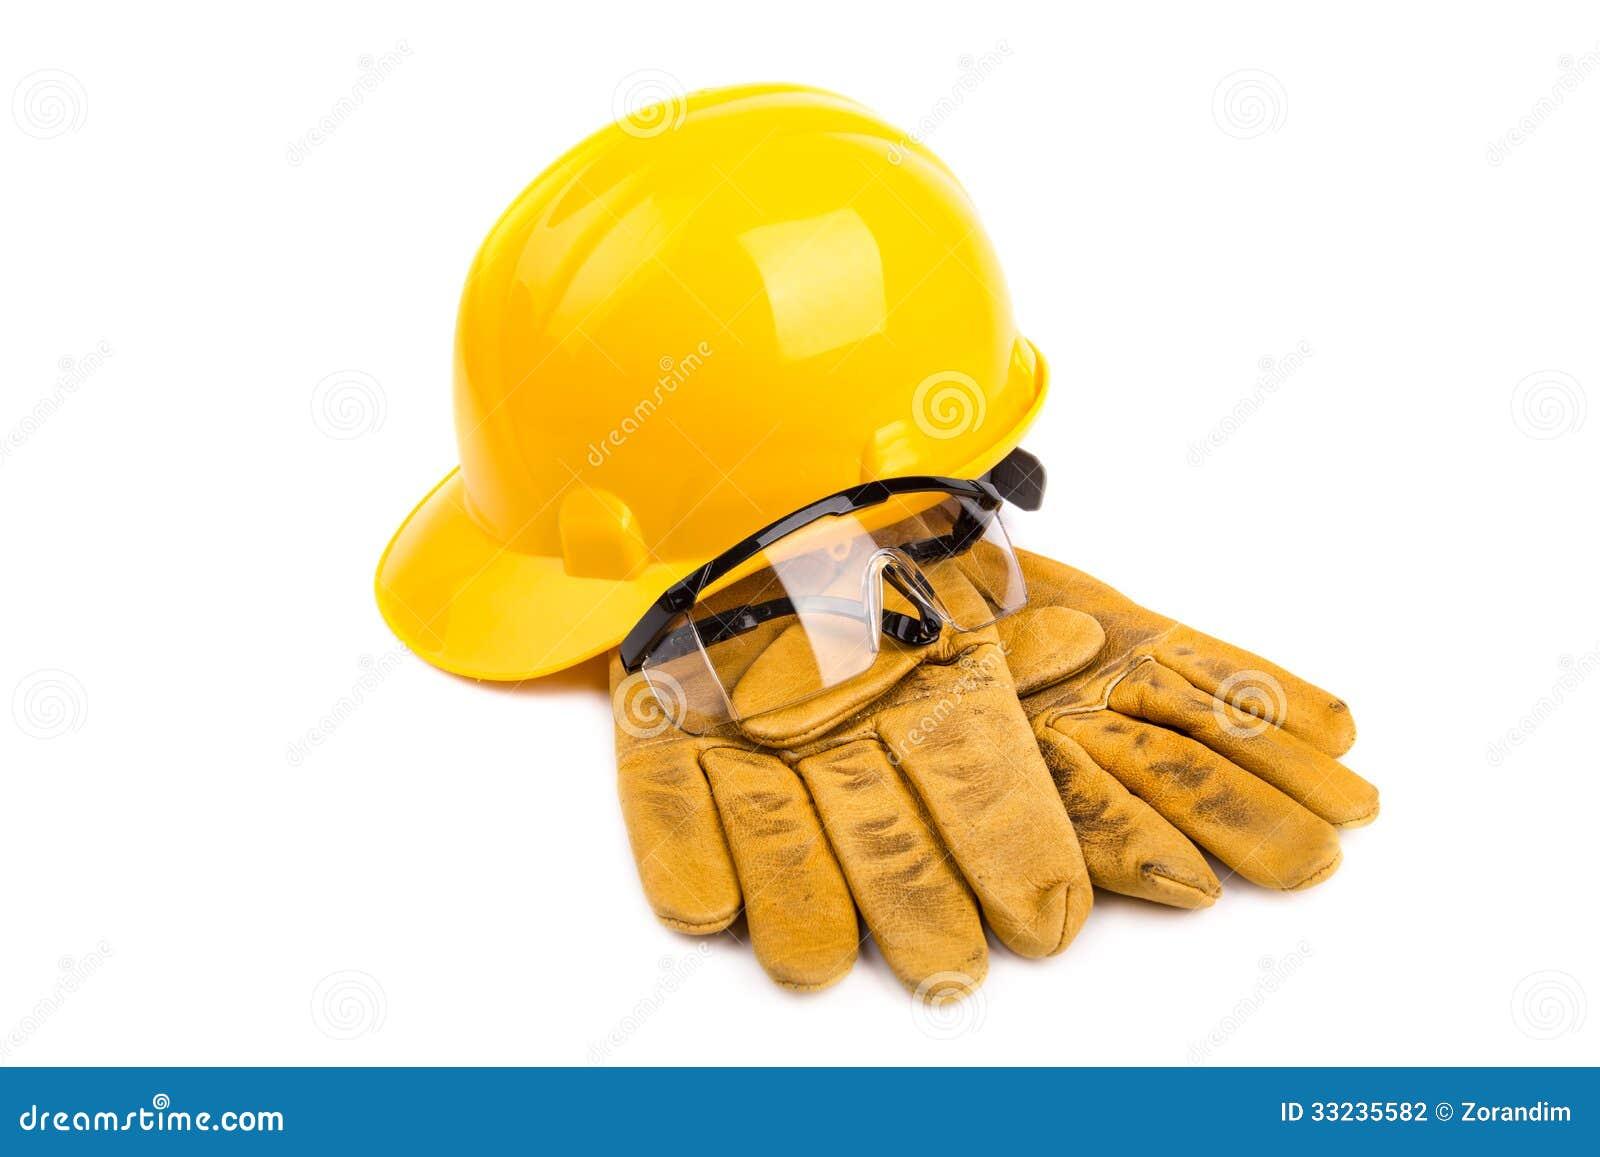 safety equipment stock photography image 33235582 Welding Clip Art Illustrations Welder Clip Art